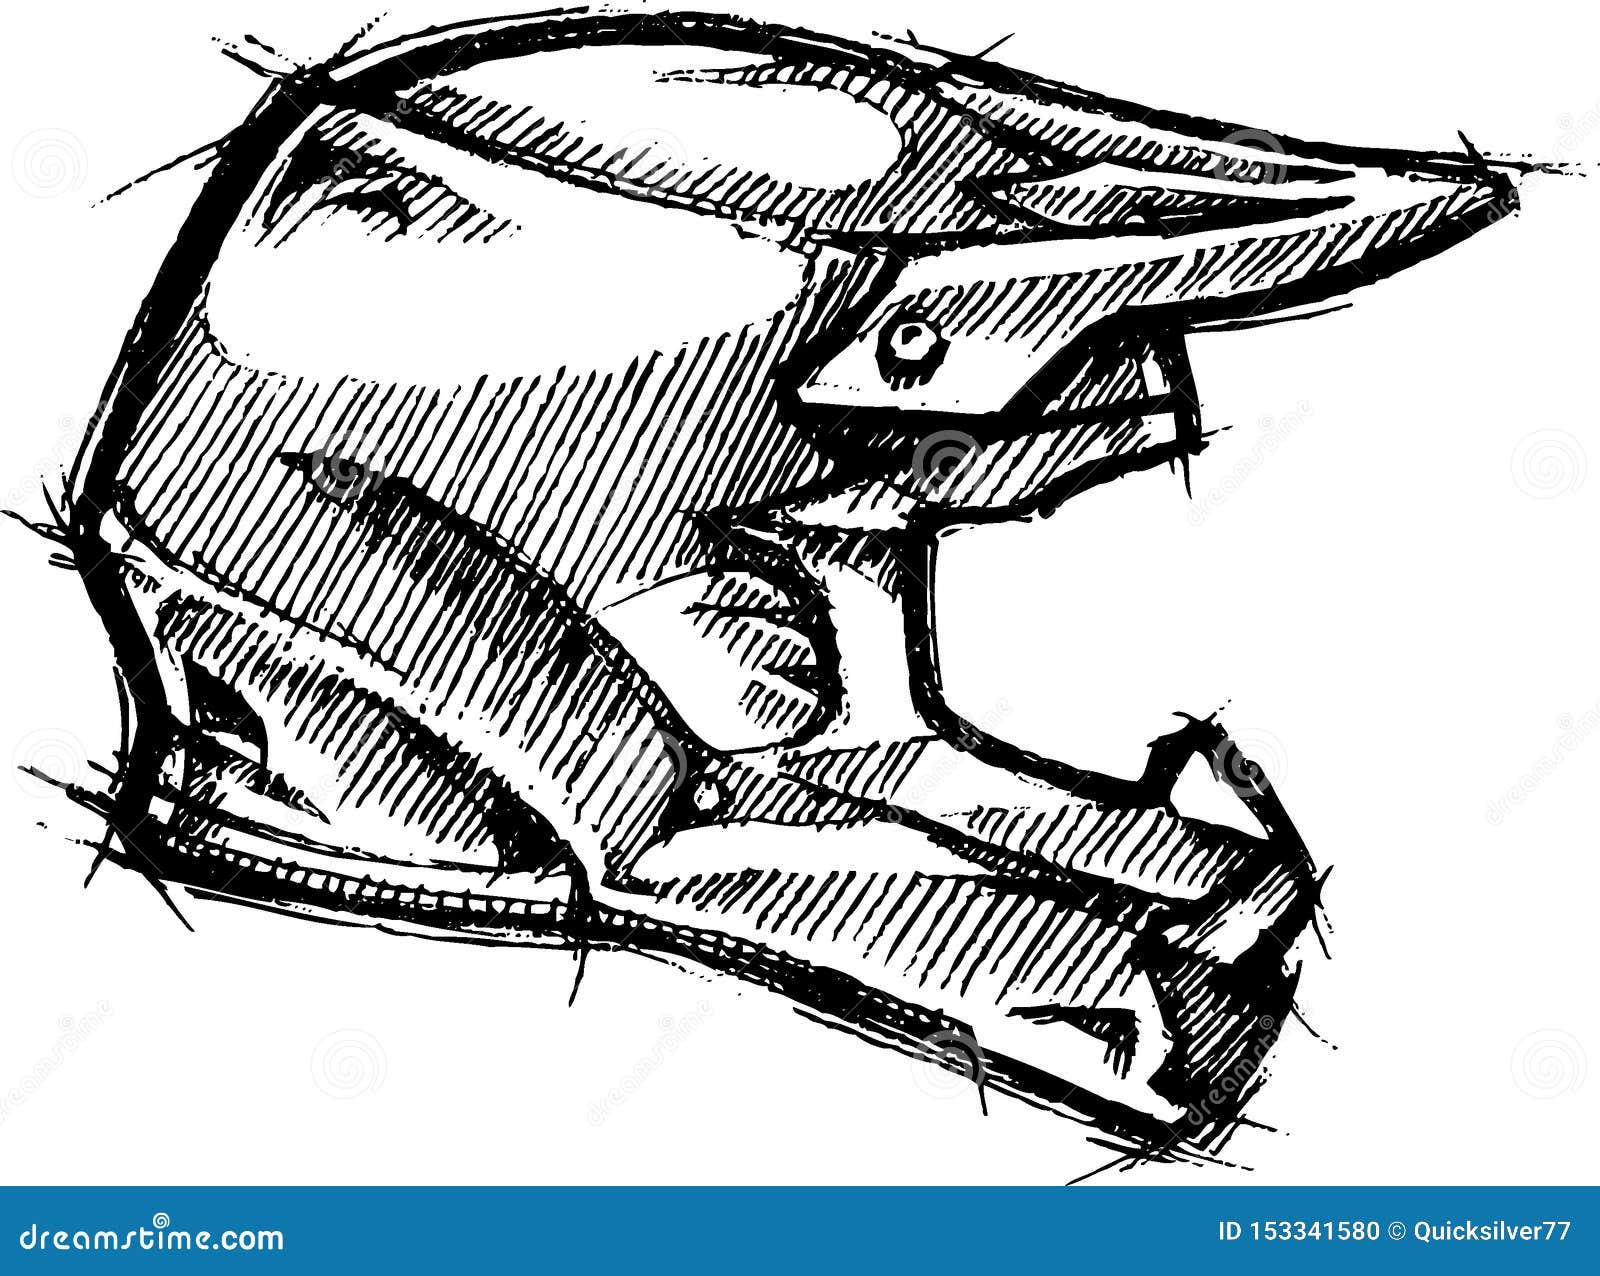 Dirt Bike Helmet Sketch Stock Vector Illustration Of Sporty 153341580